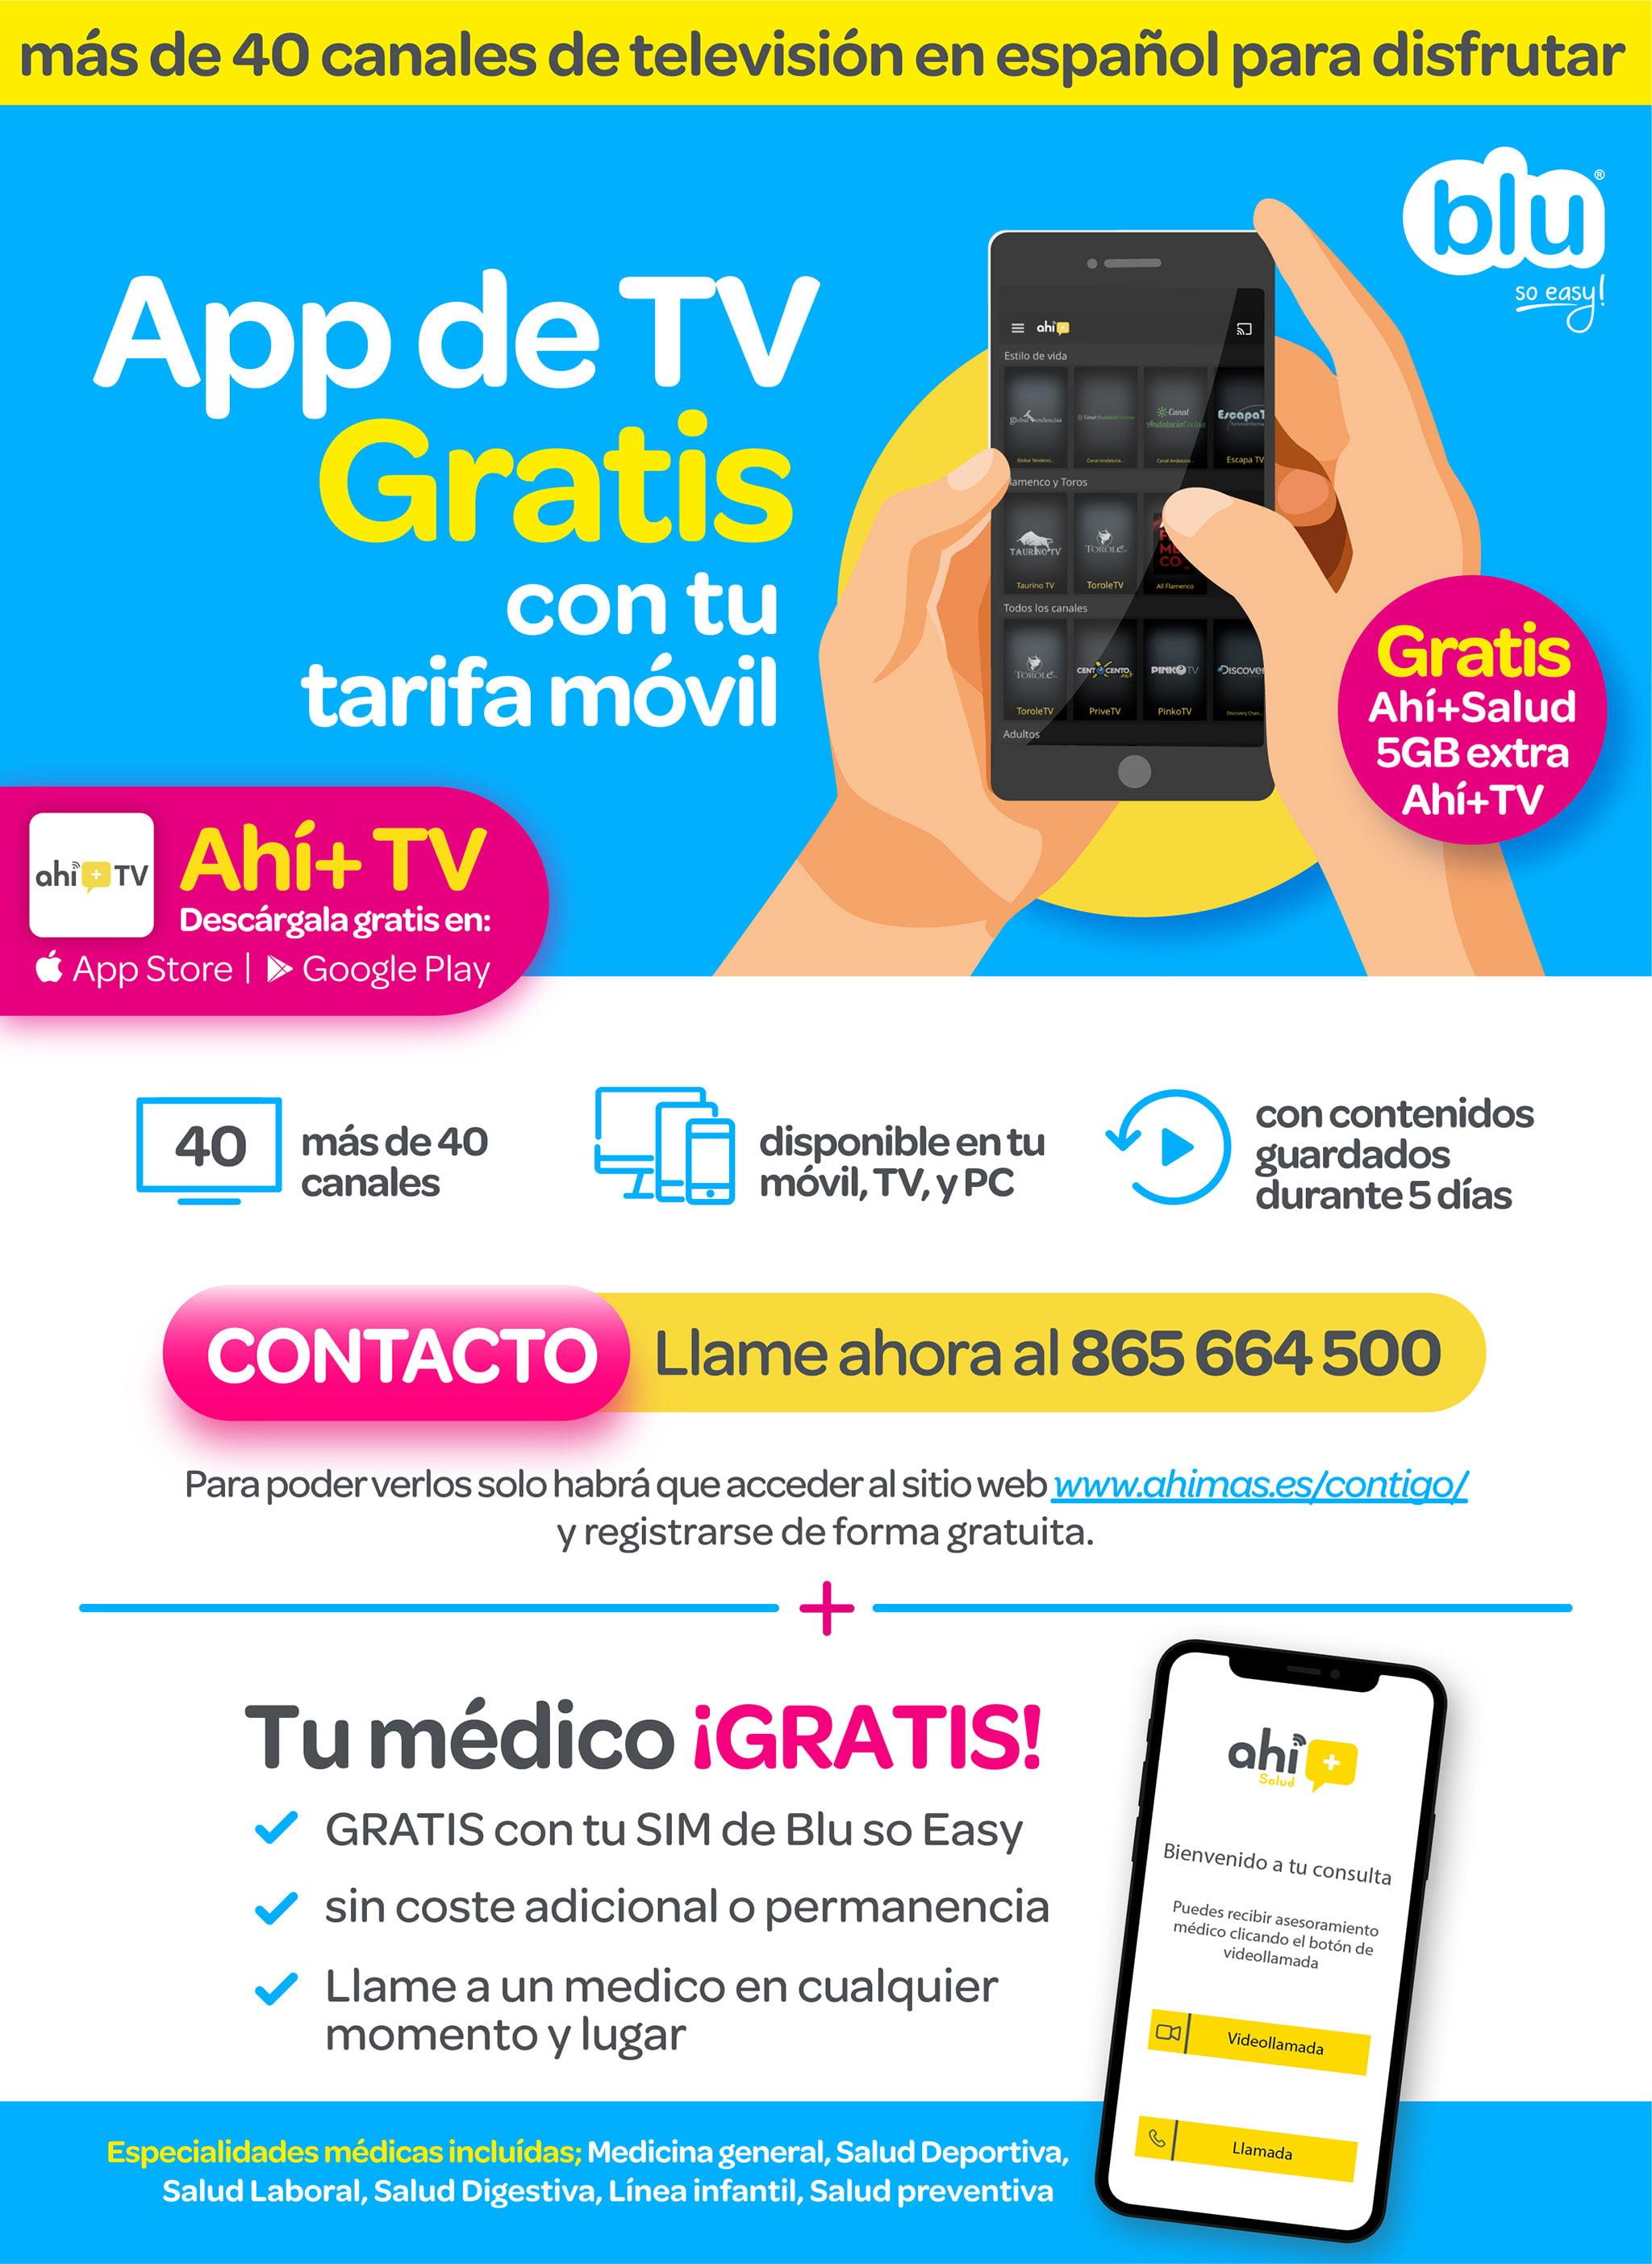 App promozionale 'Ahi + TV' e 'Ahi + Salud' - Blu